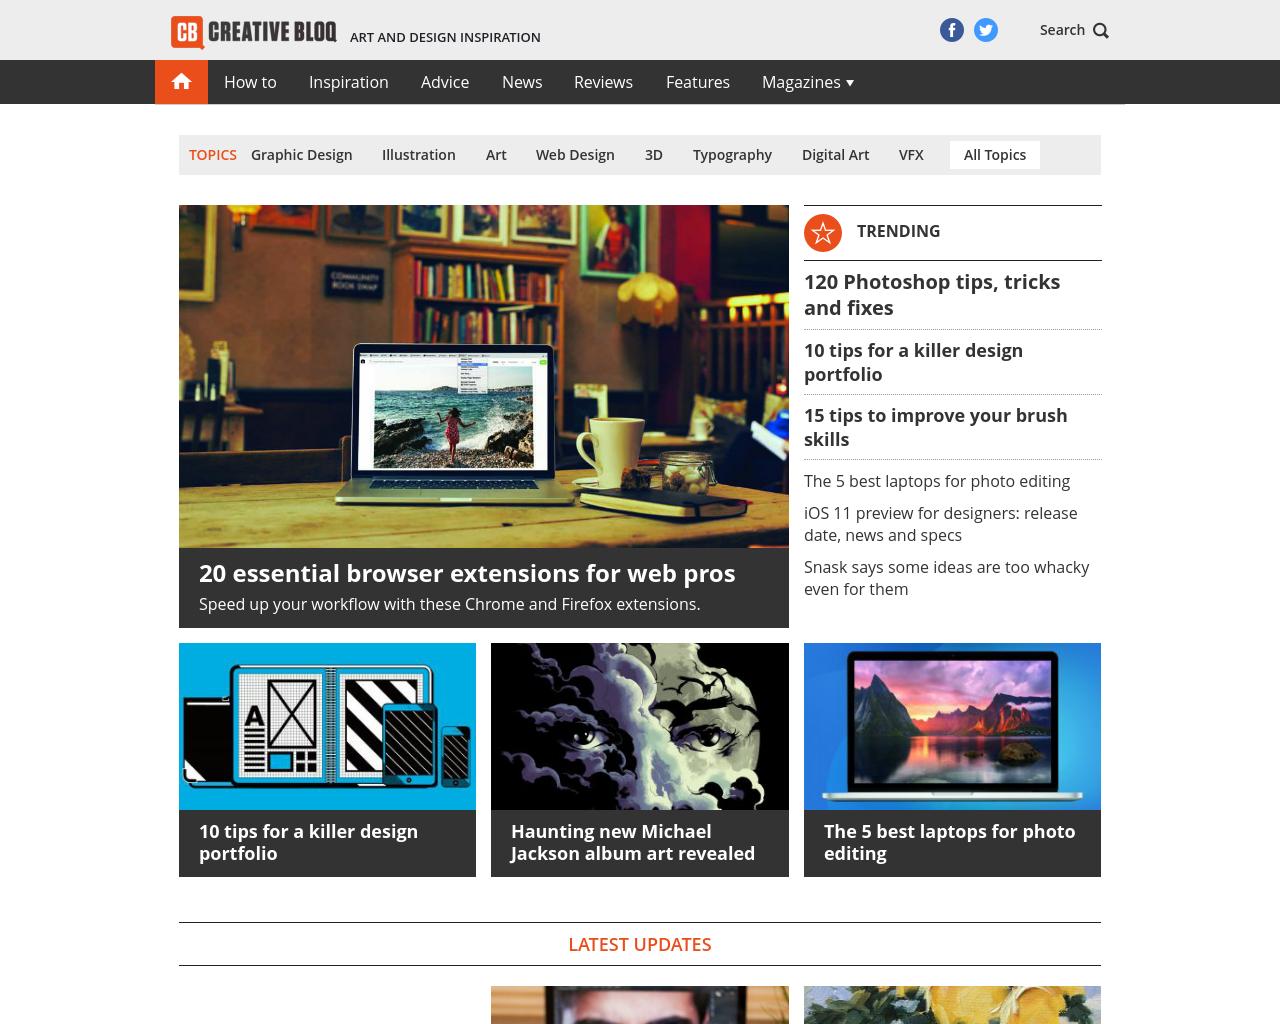 Creative-Blog-Advertising-Reviews-Pricing